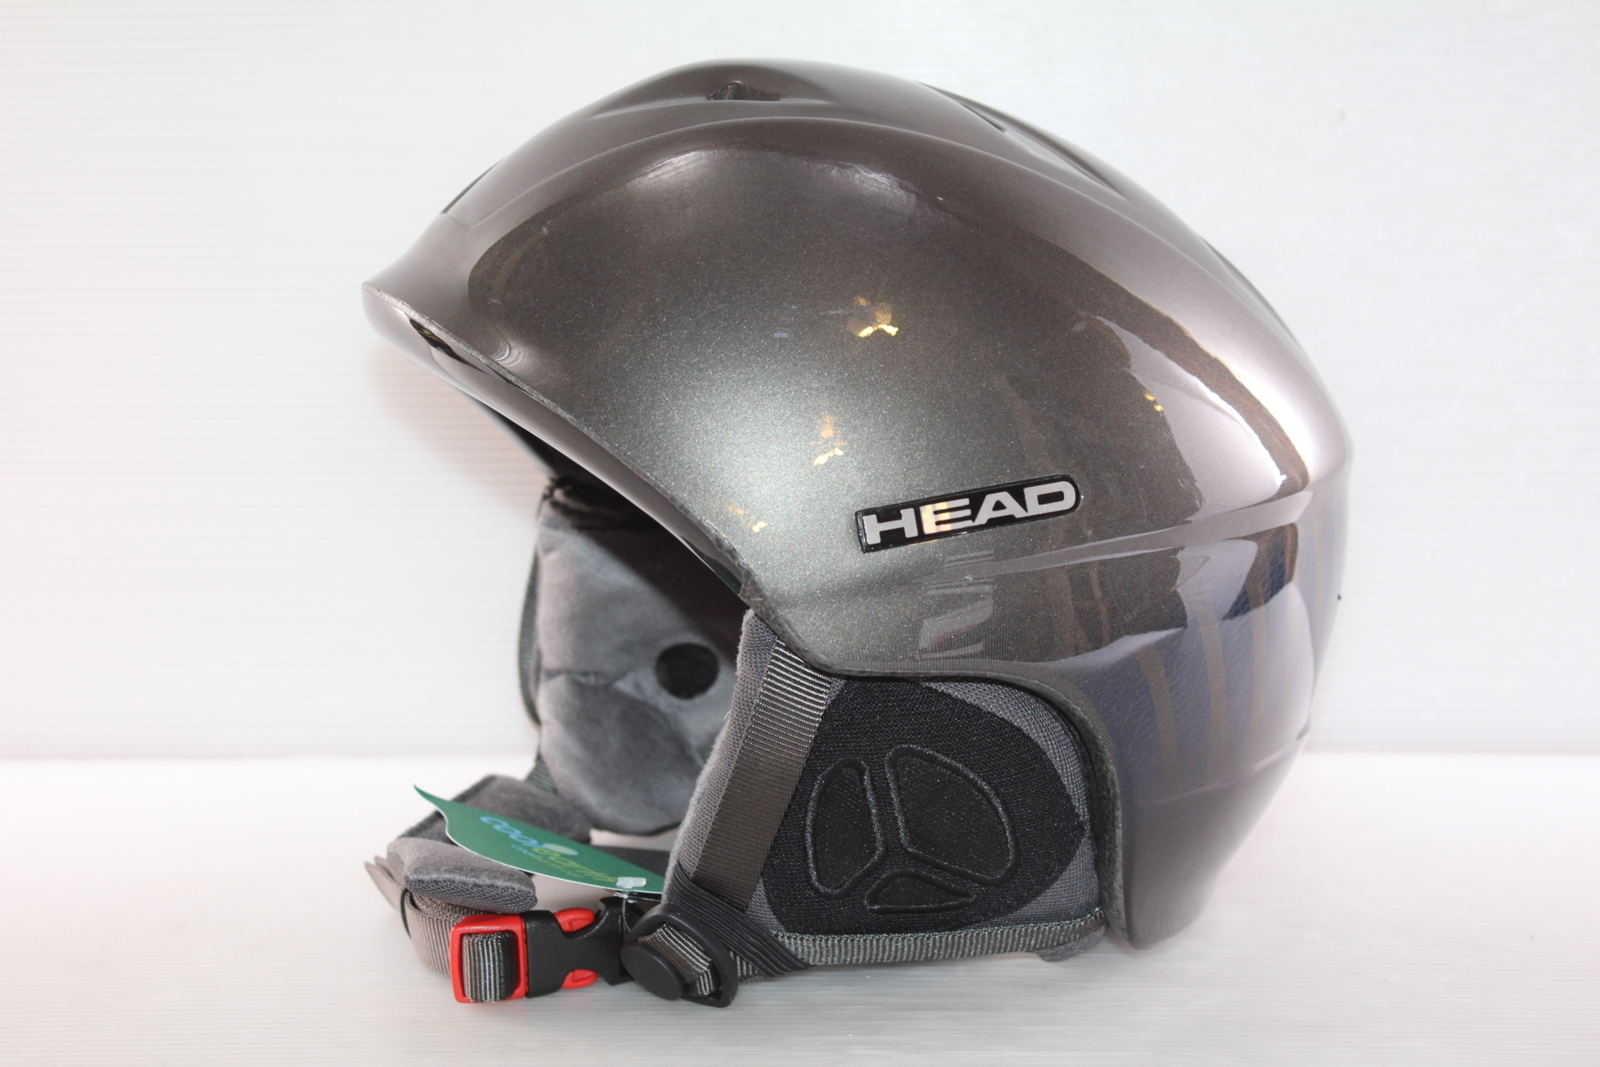 Lyžařská helma Head Rental Pro vel. 62